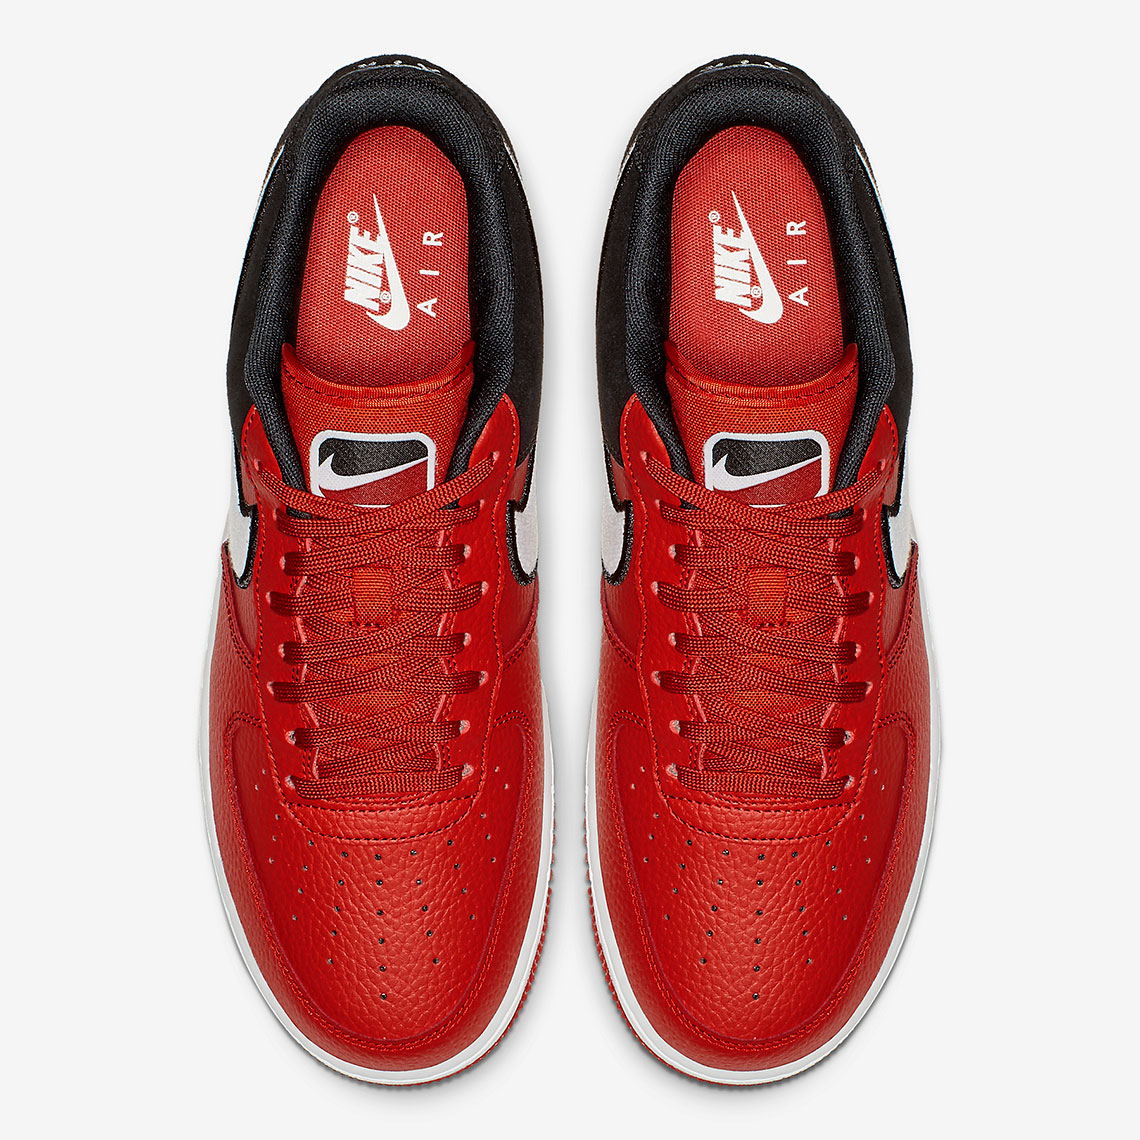 Nike Air Force 1 AO2439 001 700 600 Release Info